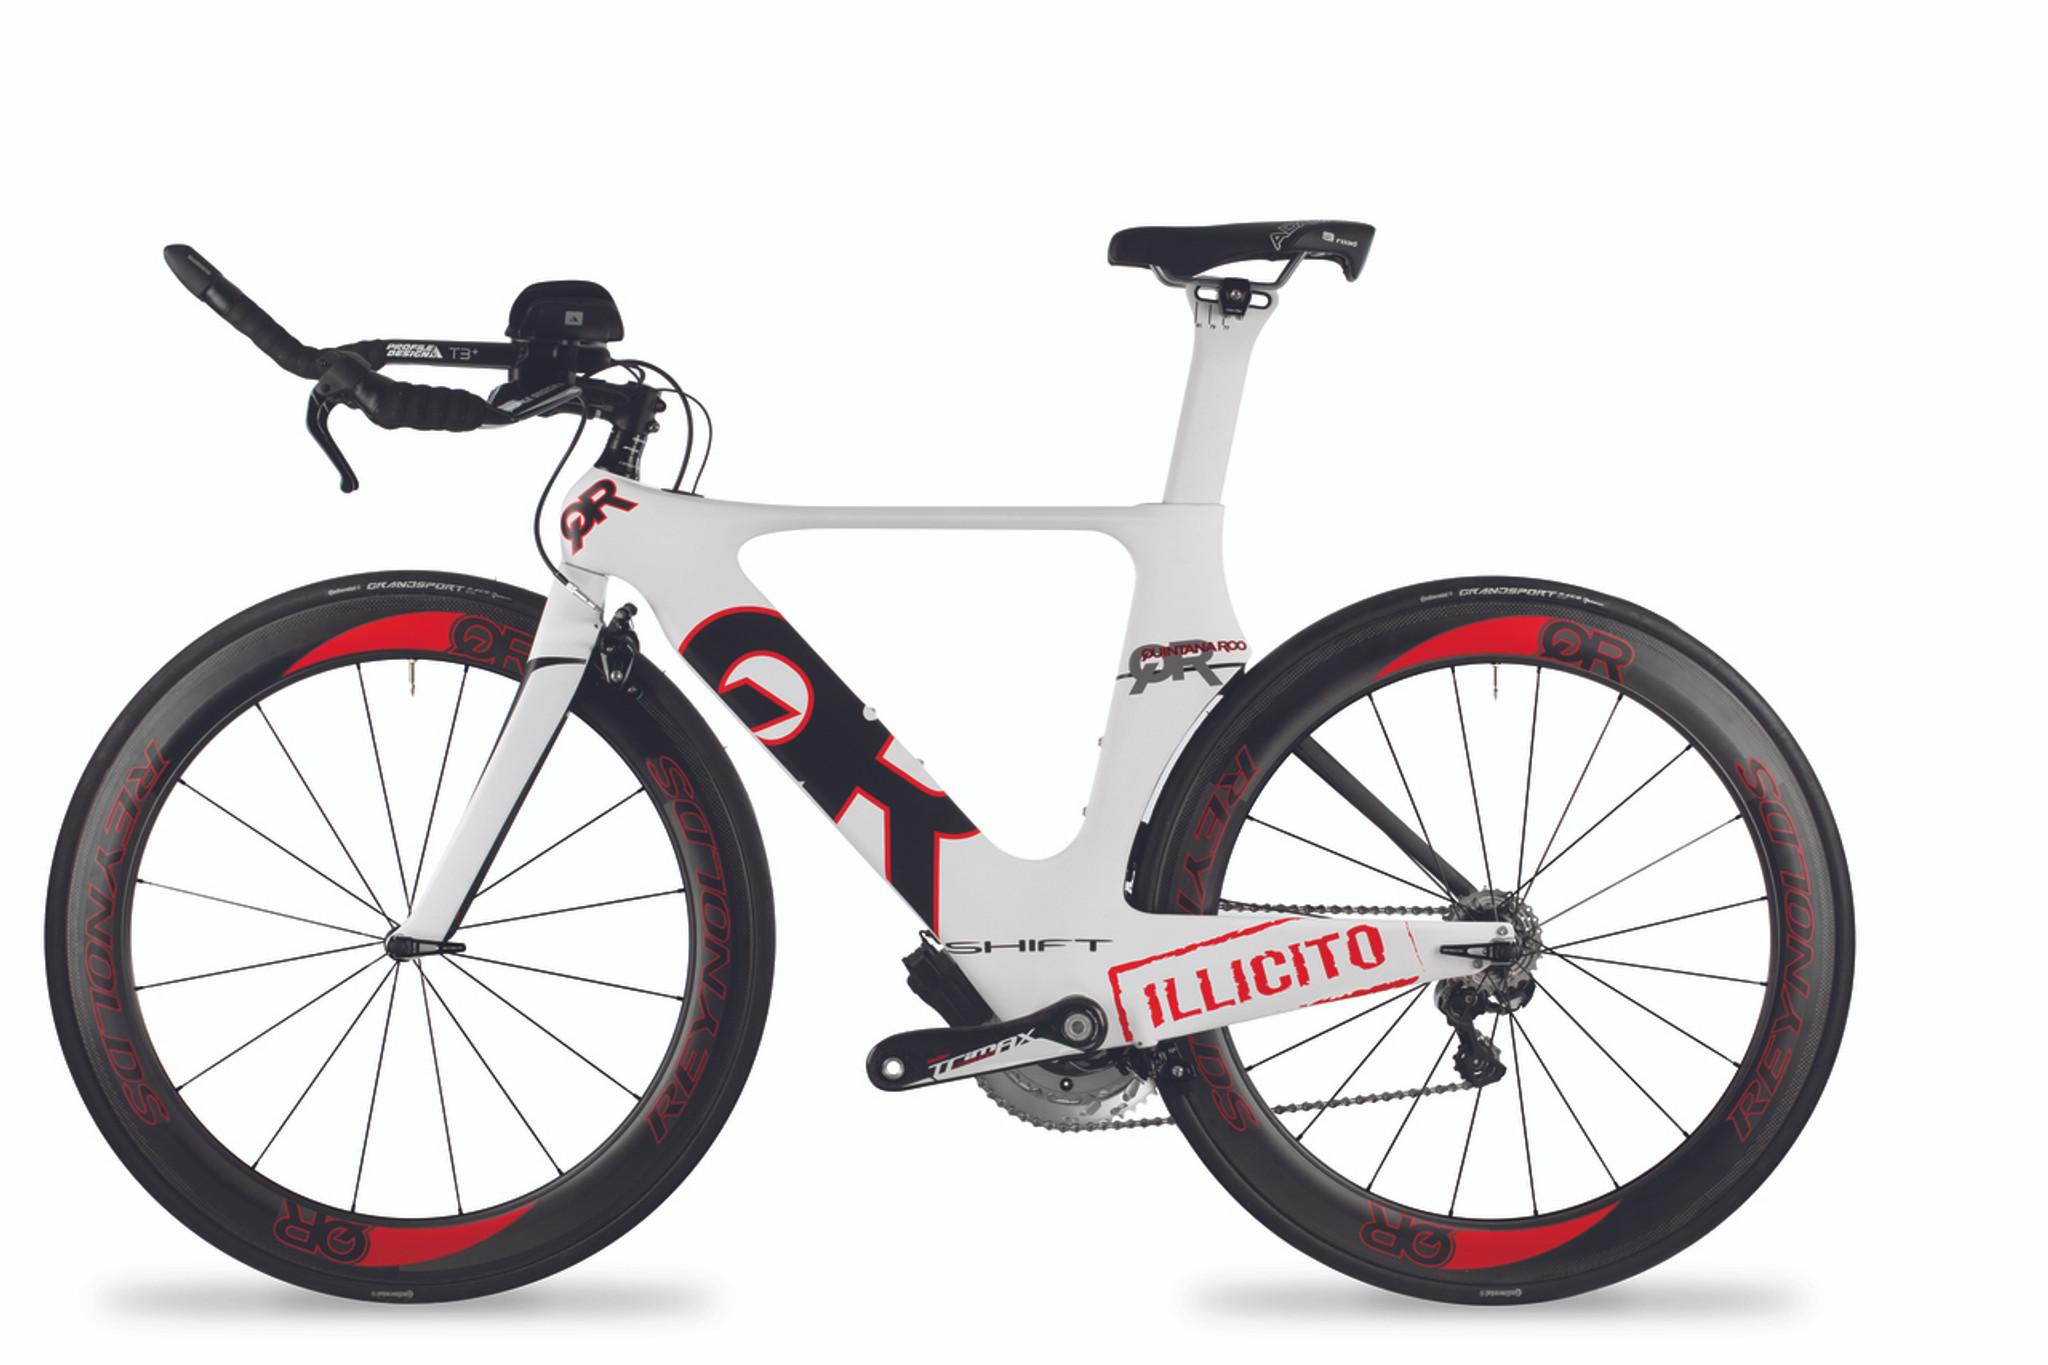 Mytriathlon Triathlon Bike Elite Package Quintana Roo Illicito